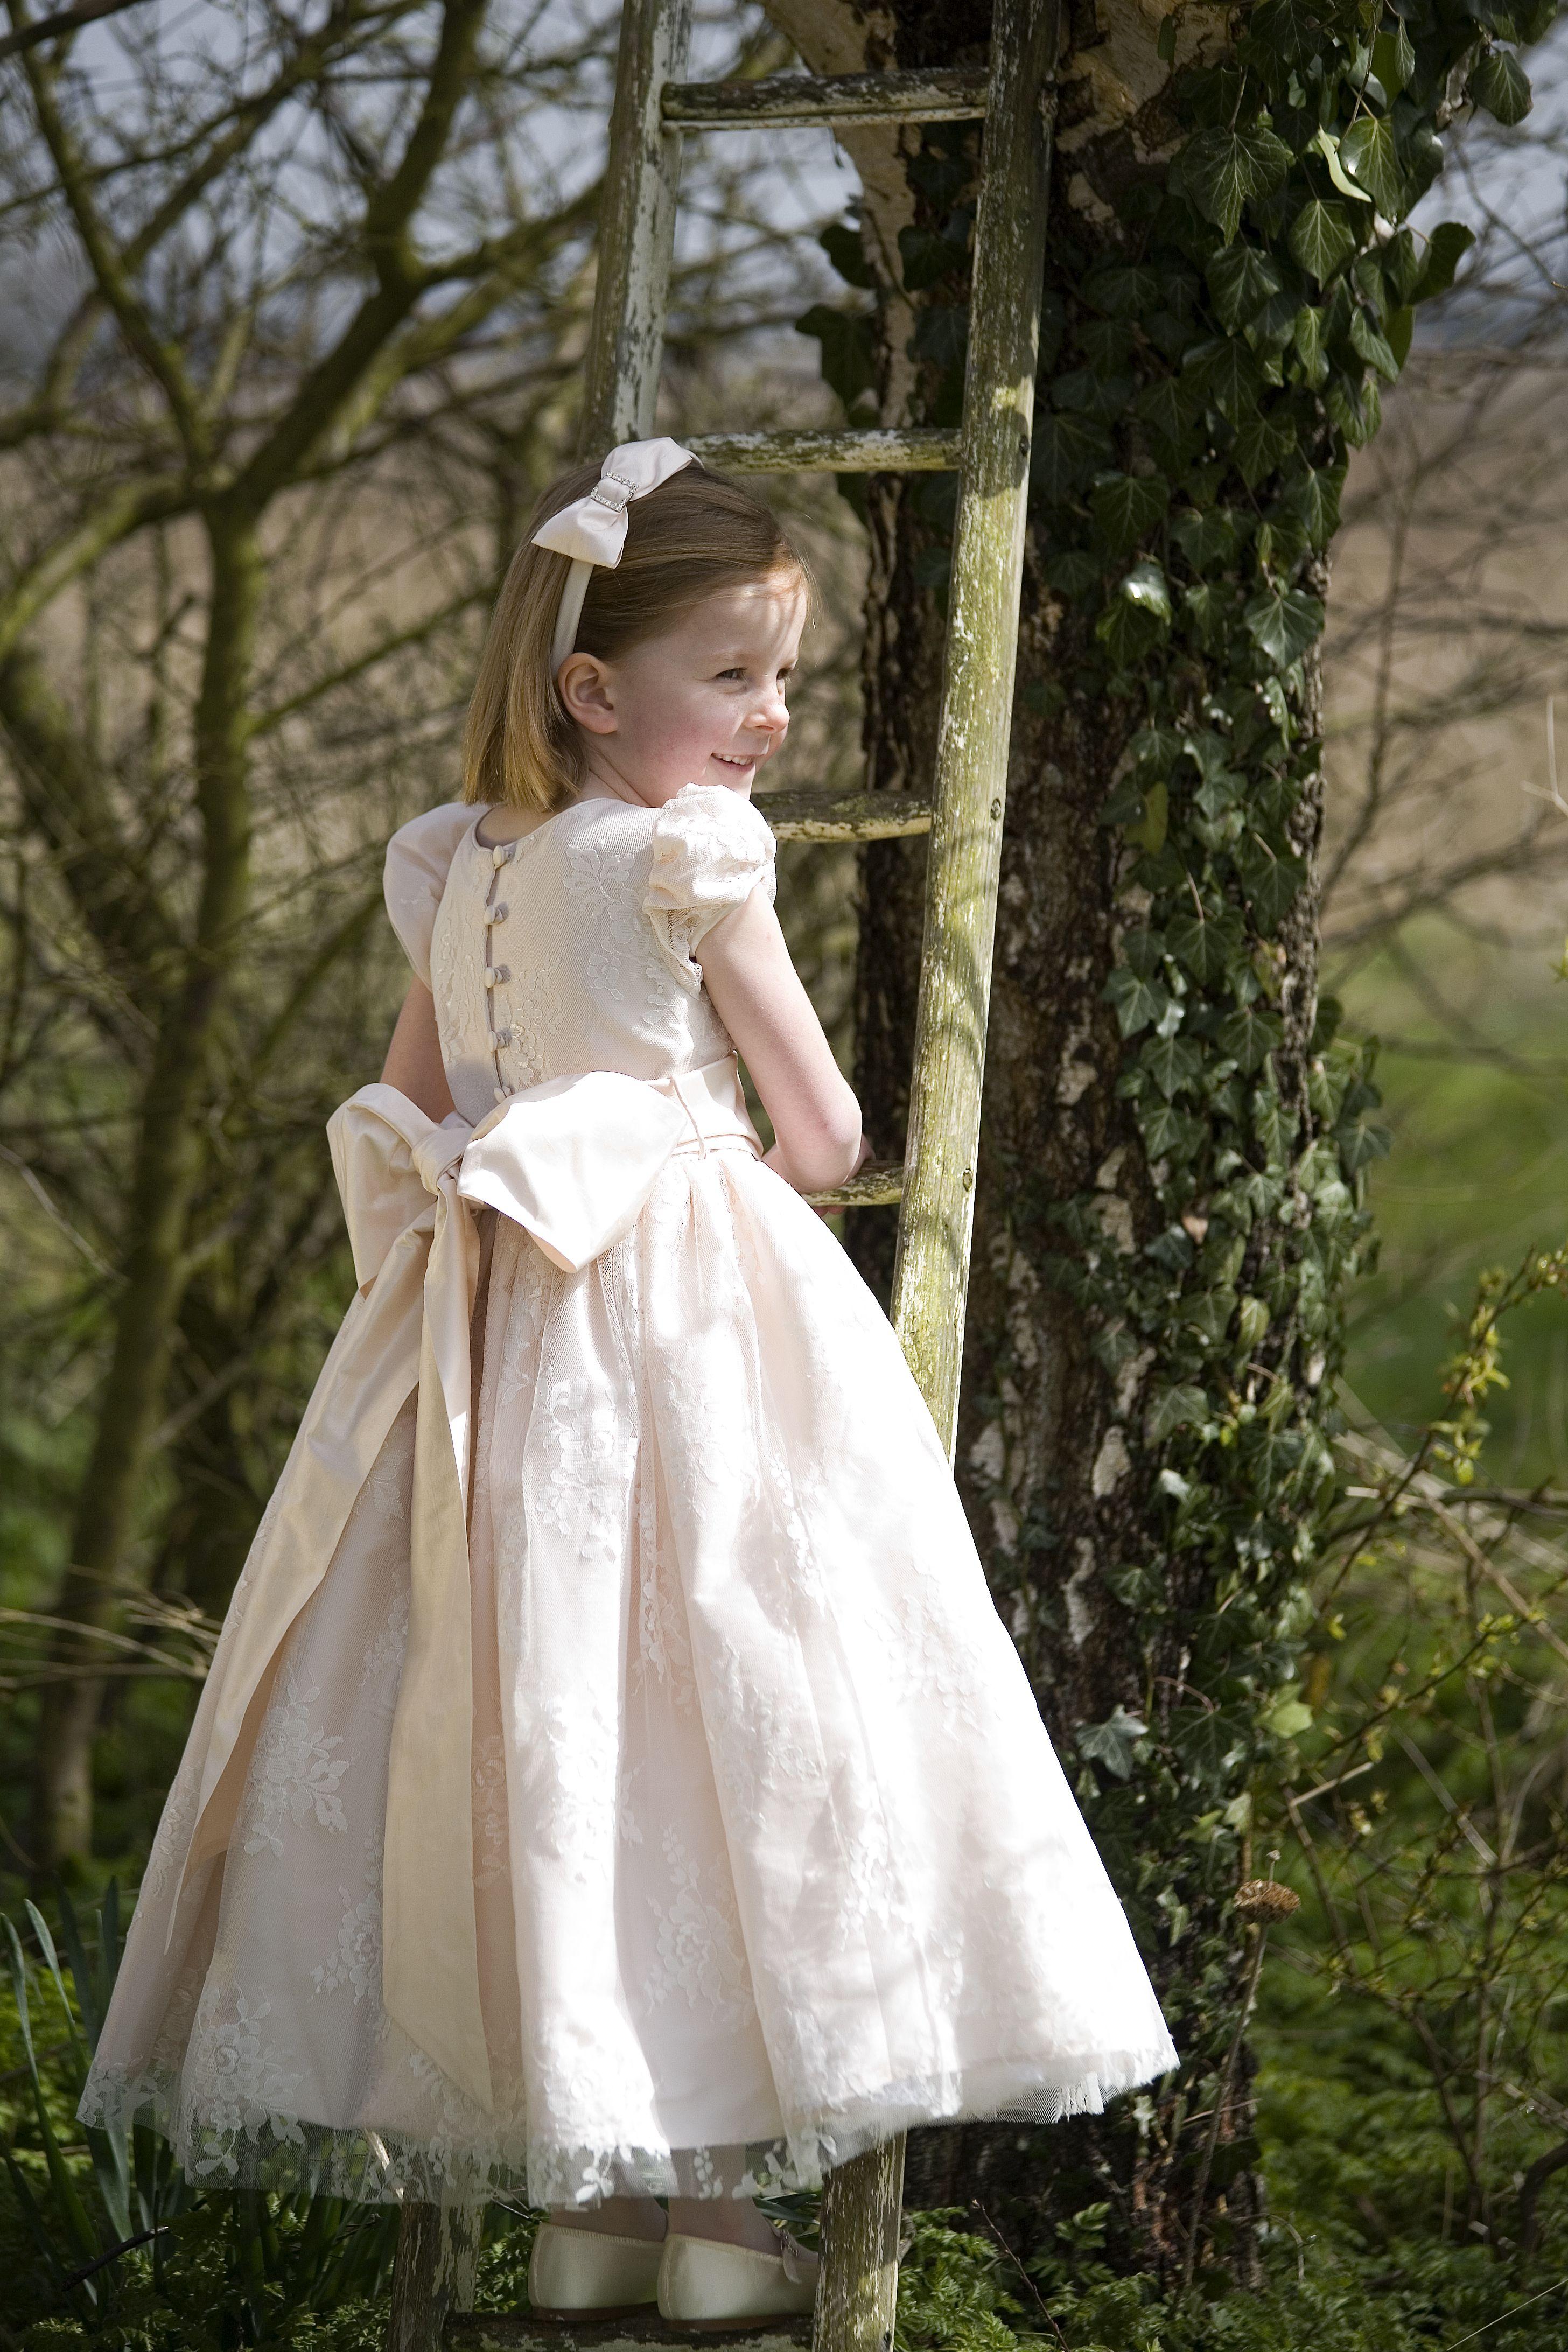 Nature wedding dress  Nicki Macfarlane  Wedding Dress  Pinterest  Page boy style